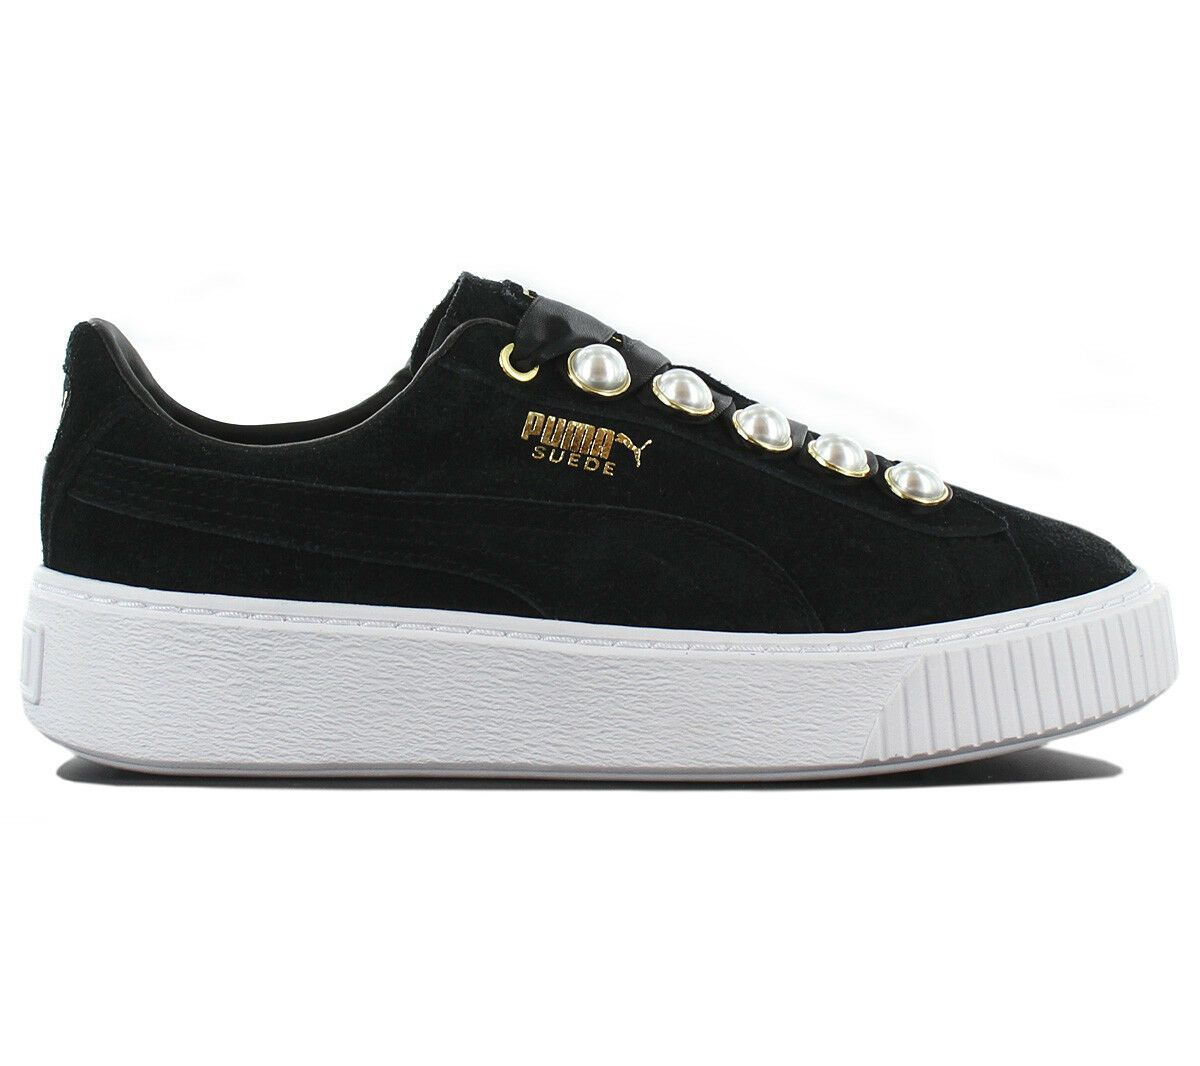 Puma Suede Platform Bling Damen Sneaker Schuhe Leder Schwarz 366688 01 Turnschuh In 2020 Nike Schuhe Sneakers Vans Authentic Sneaker